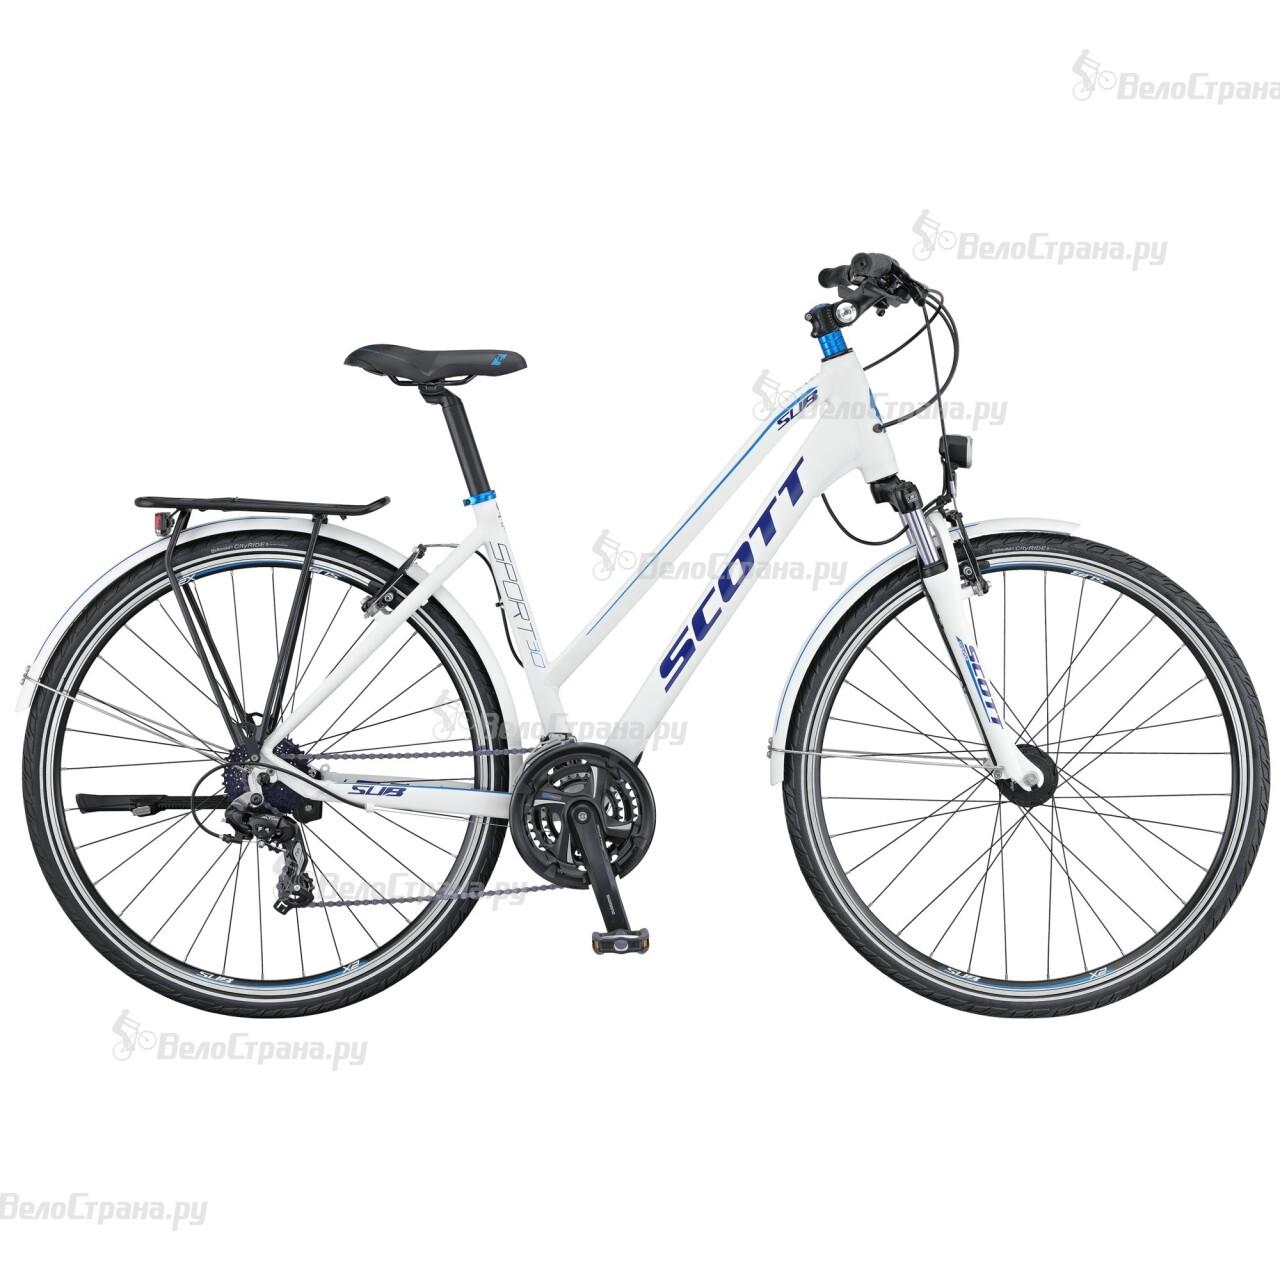 Велосипед Scott Sub Sport 30 Lady (2016)